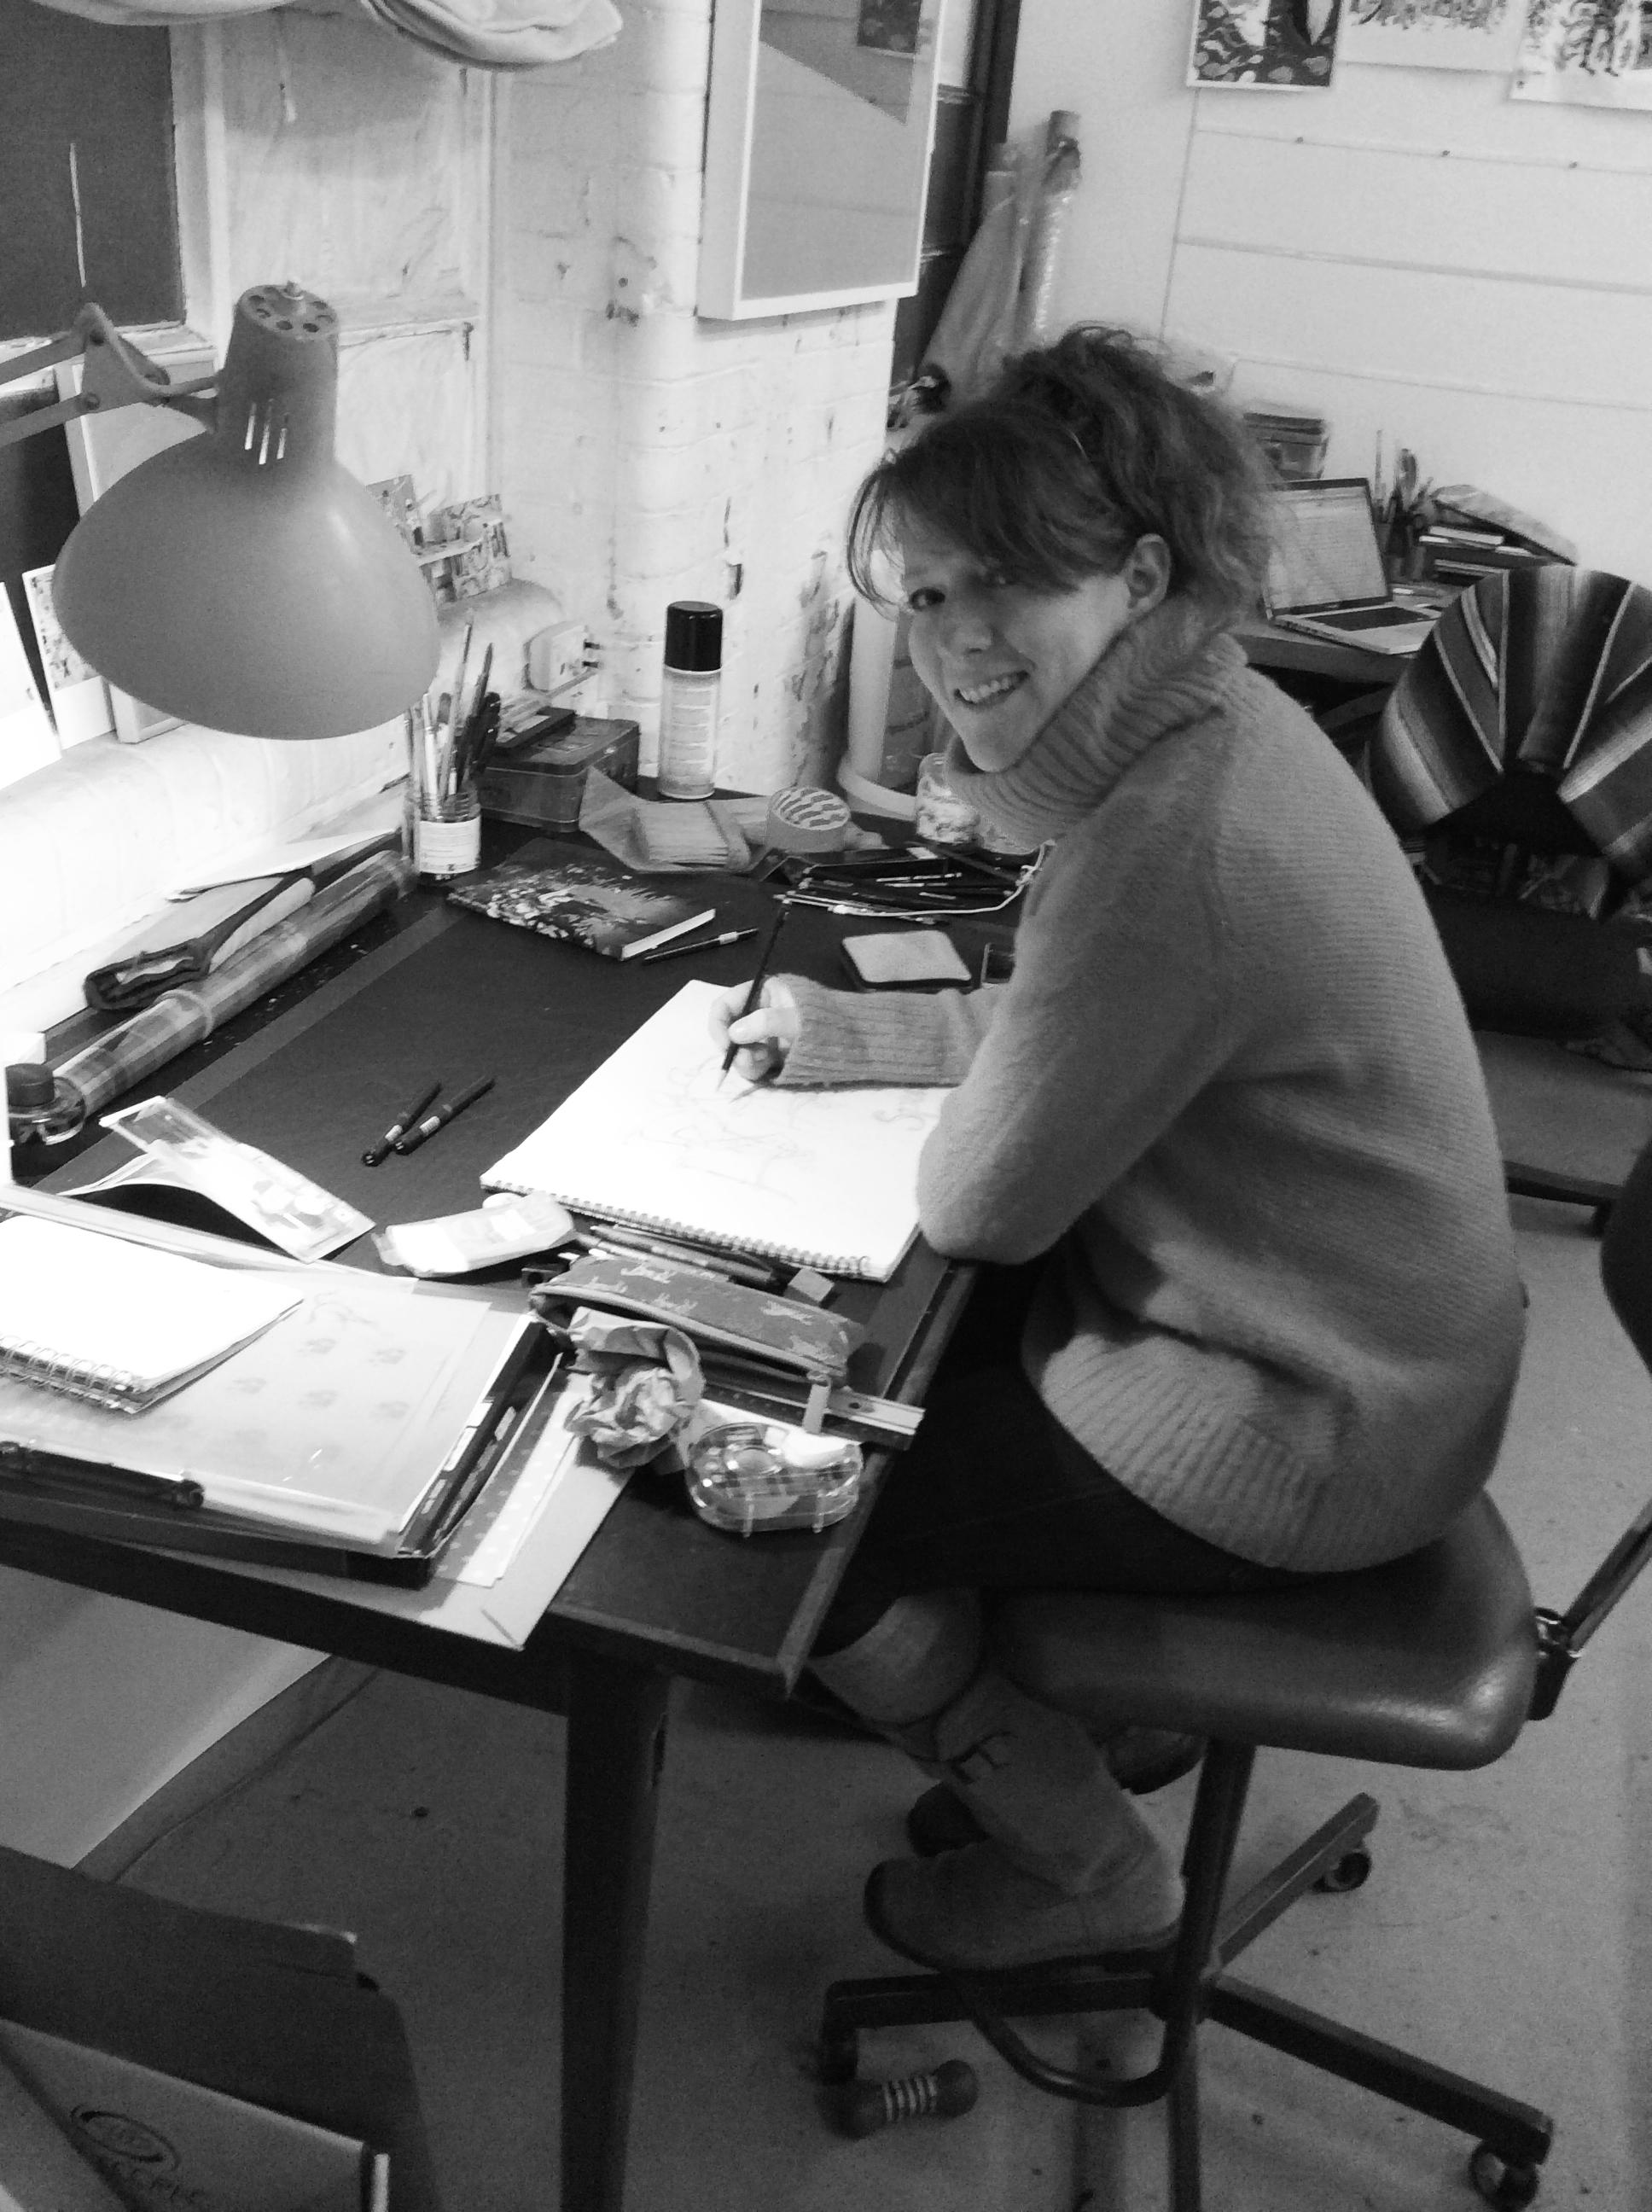 Artist and illustrator, Eliza Southwood